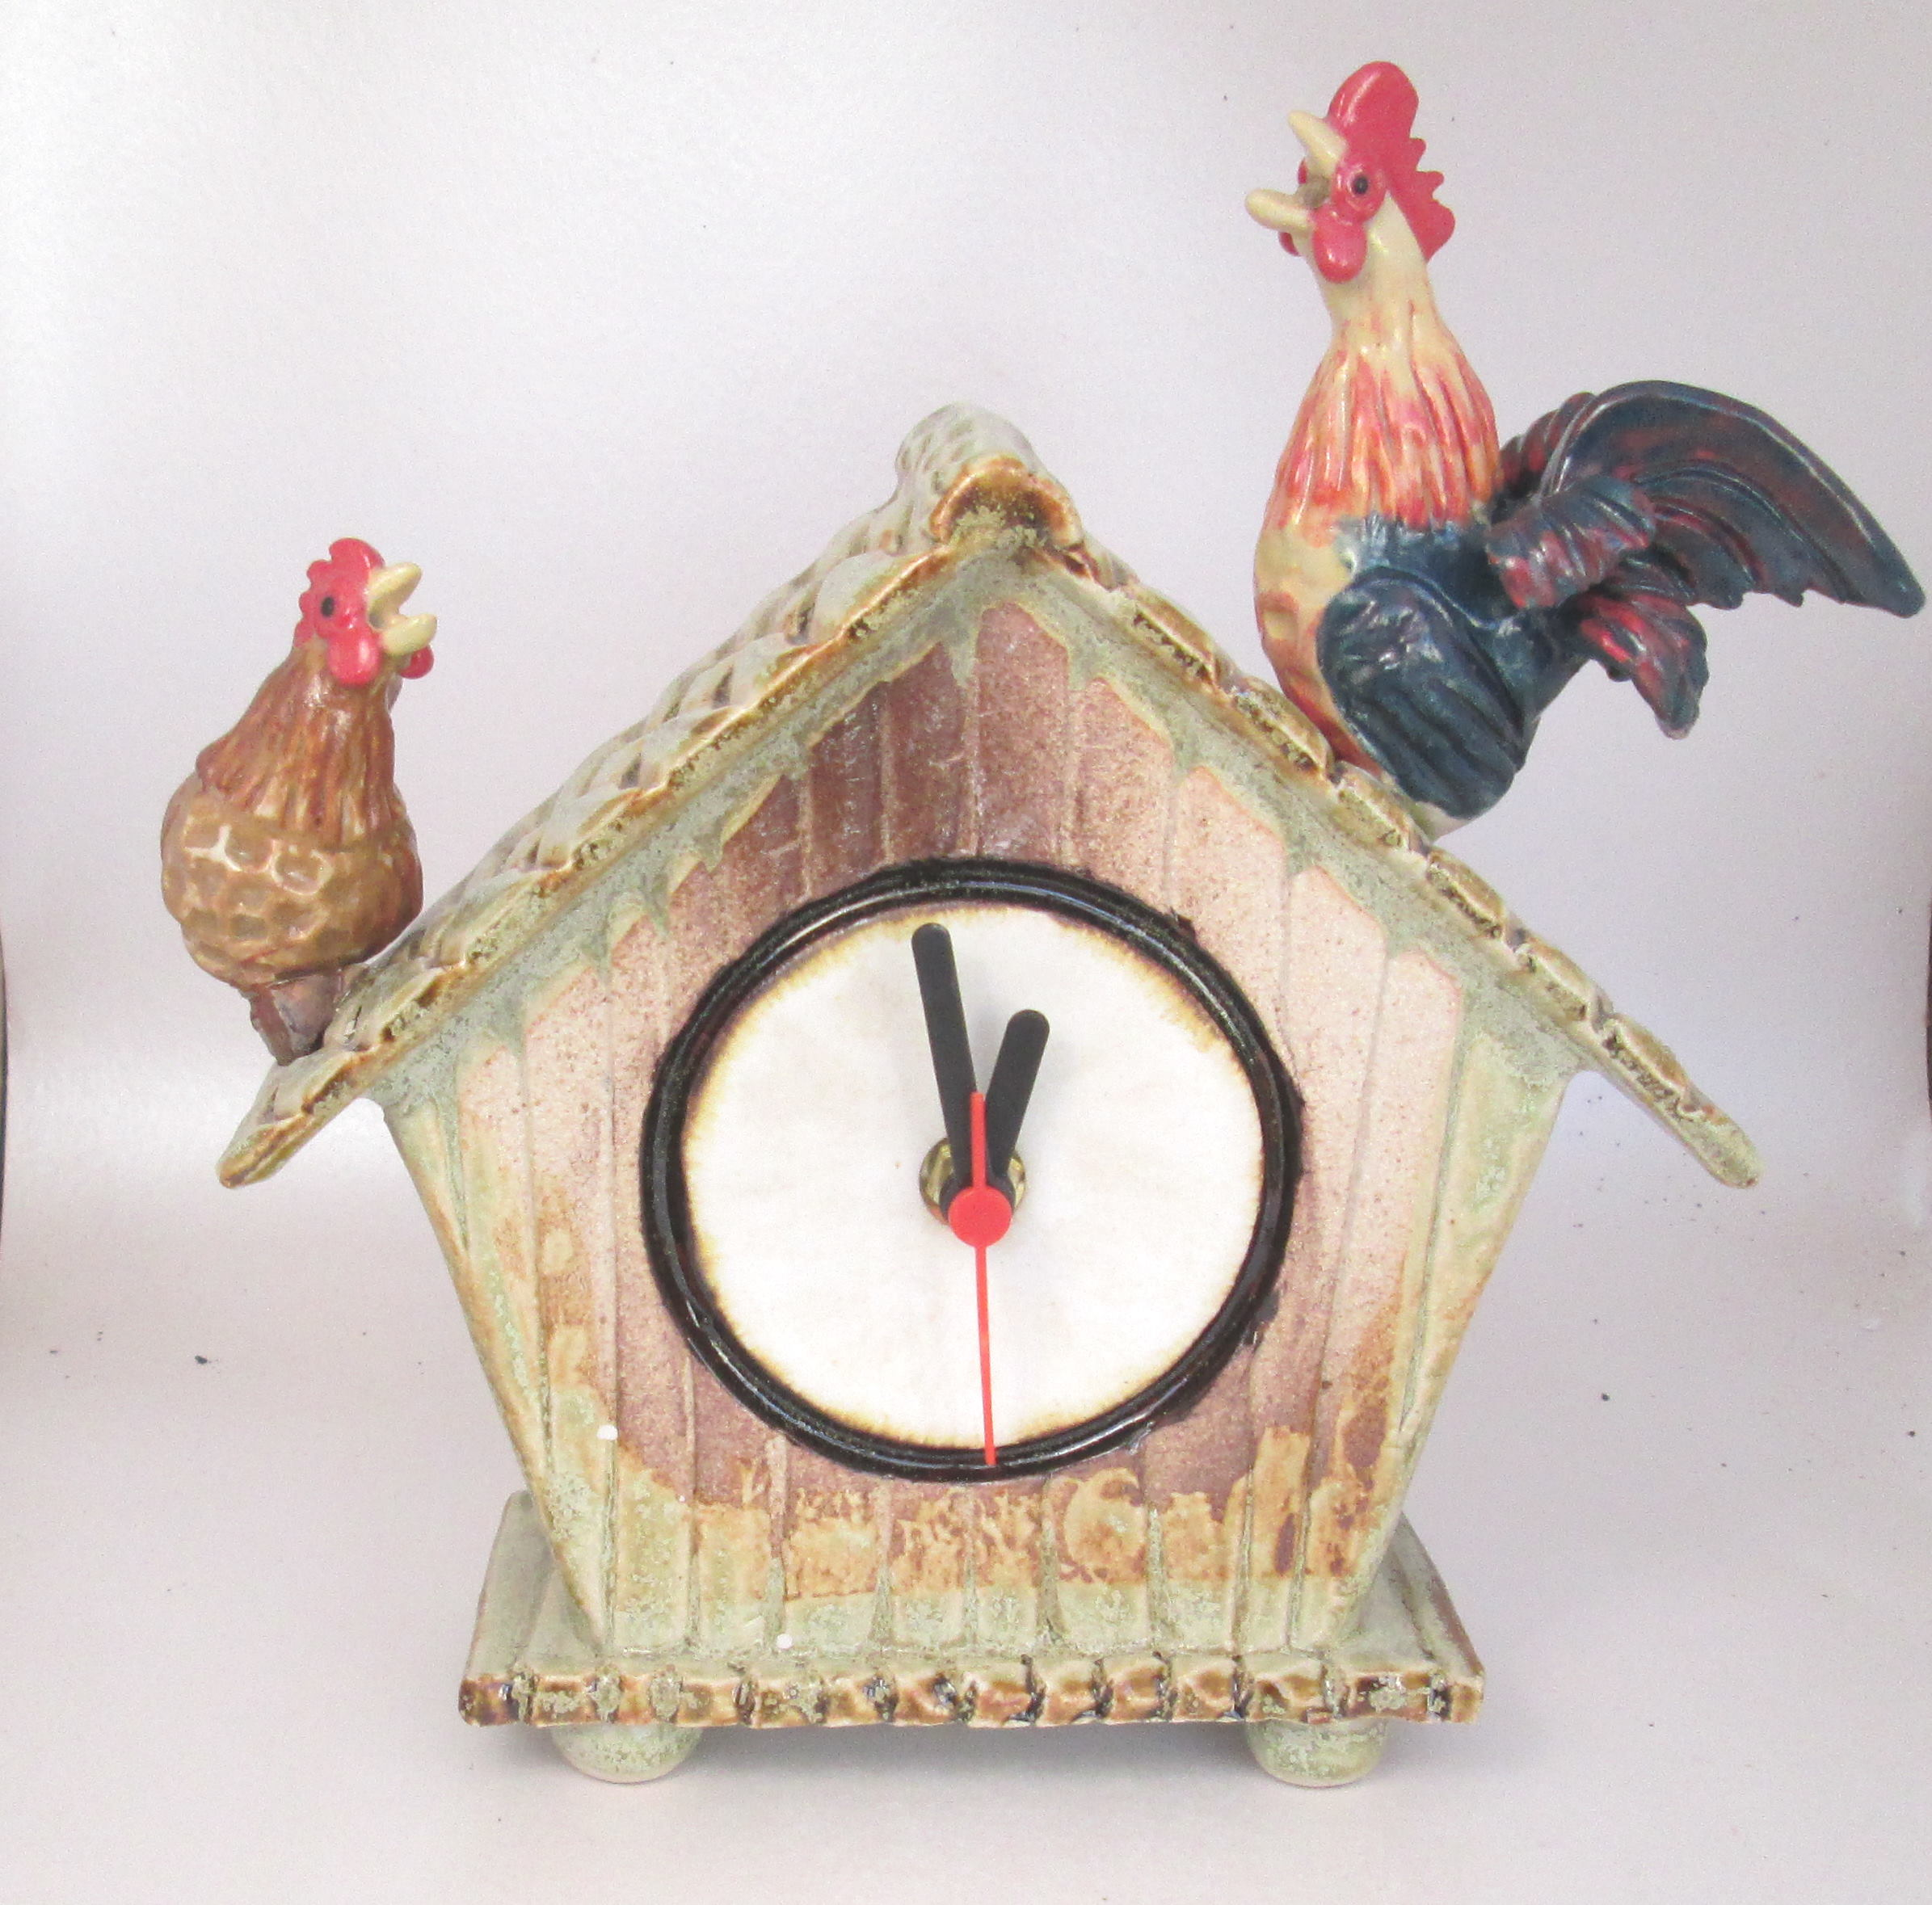 Ceramic hen house clock